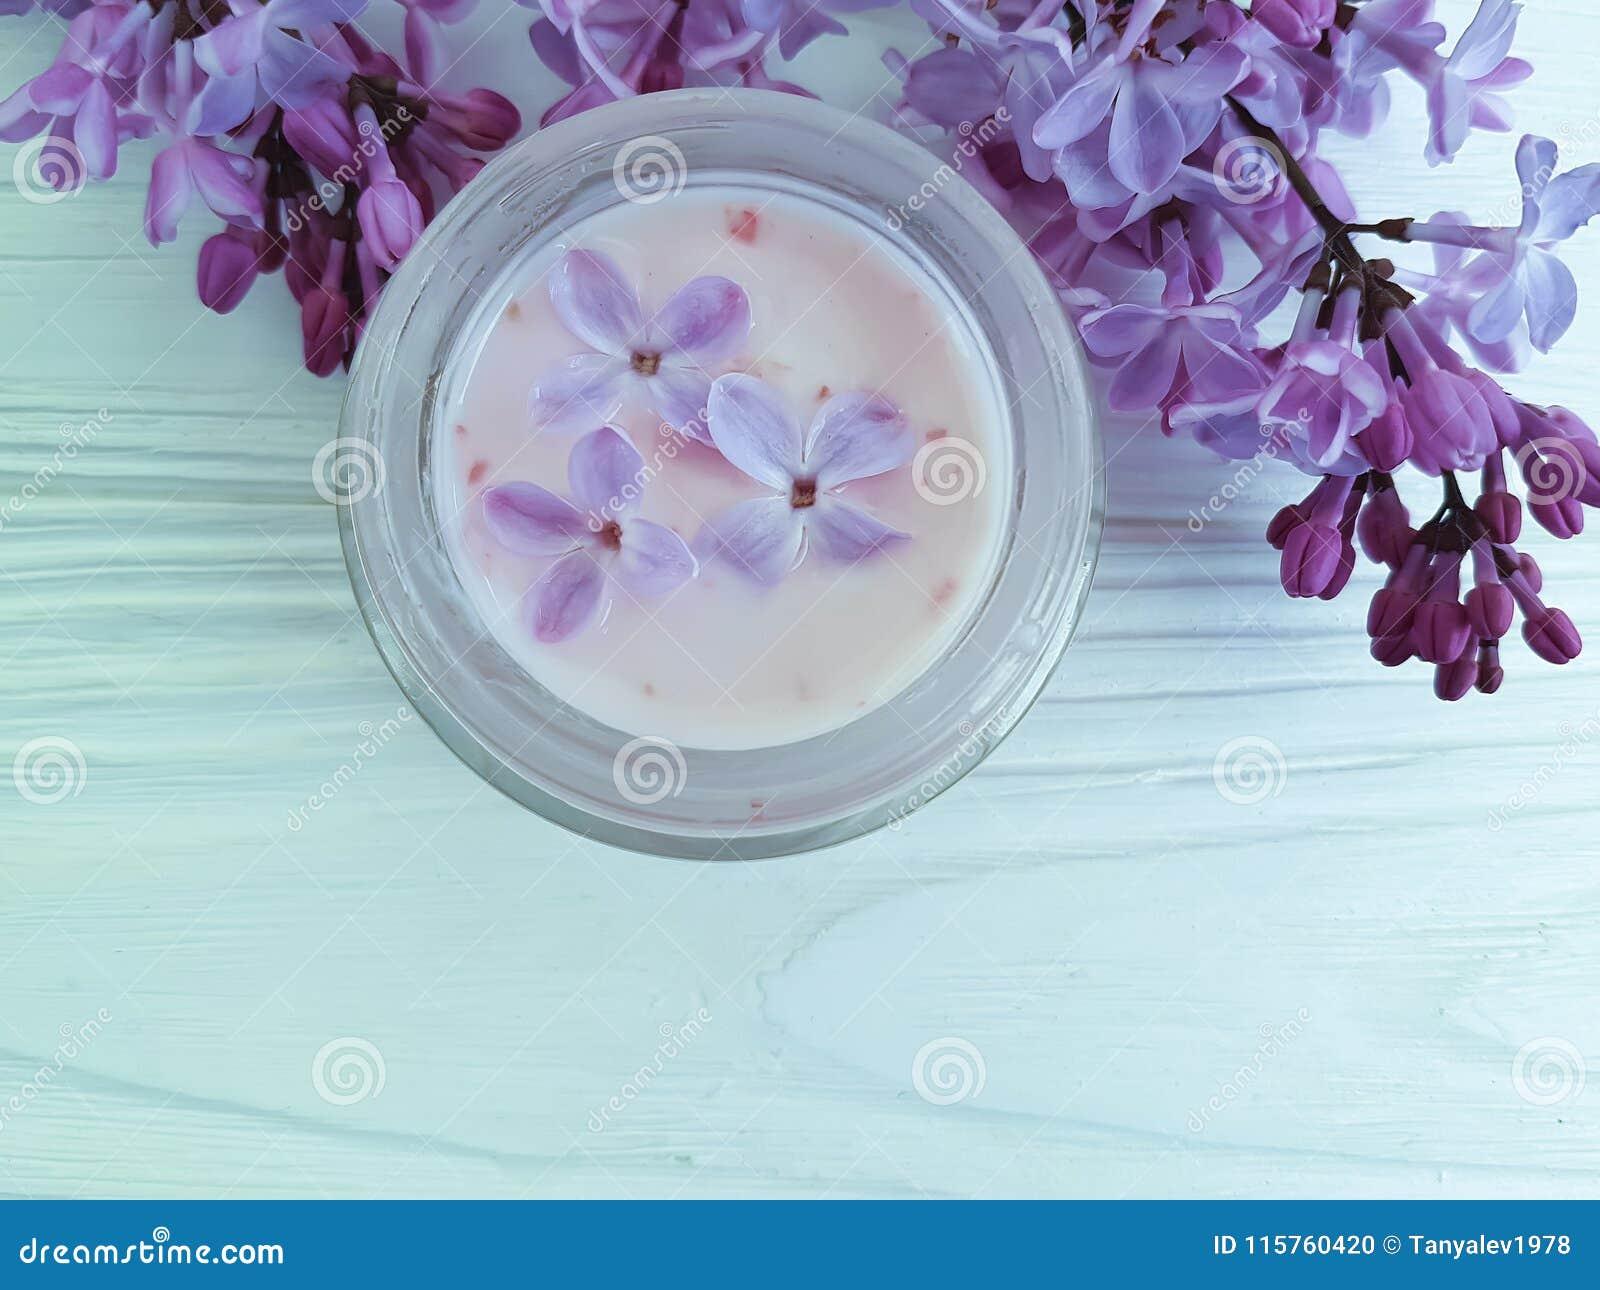 Cream Cosmetic Scrub Lilac Flower Moisturizer Aromatic Treatment On